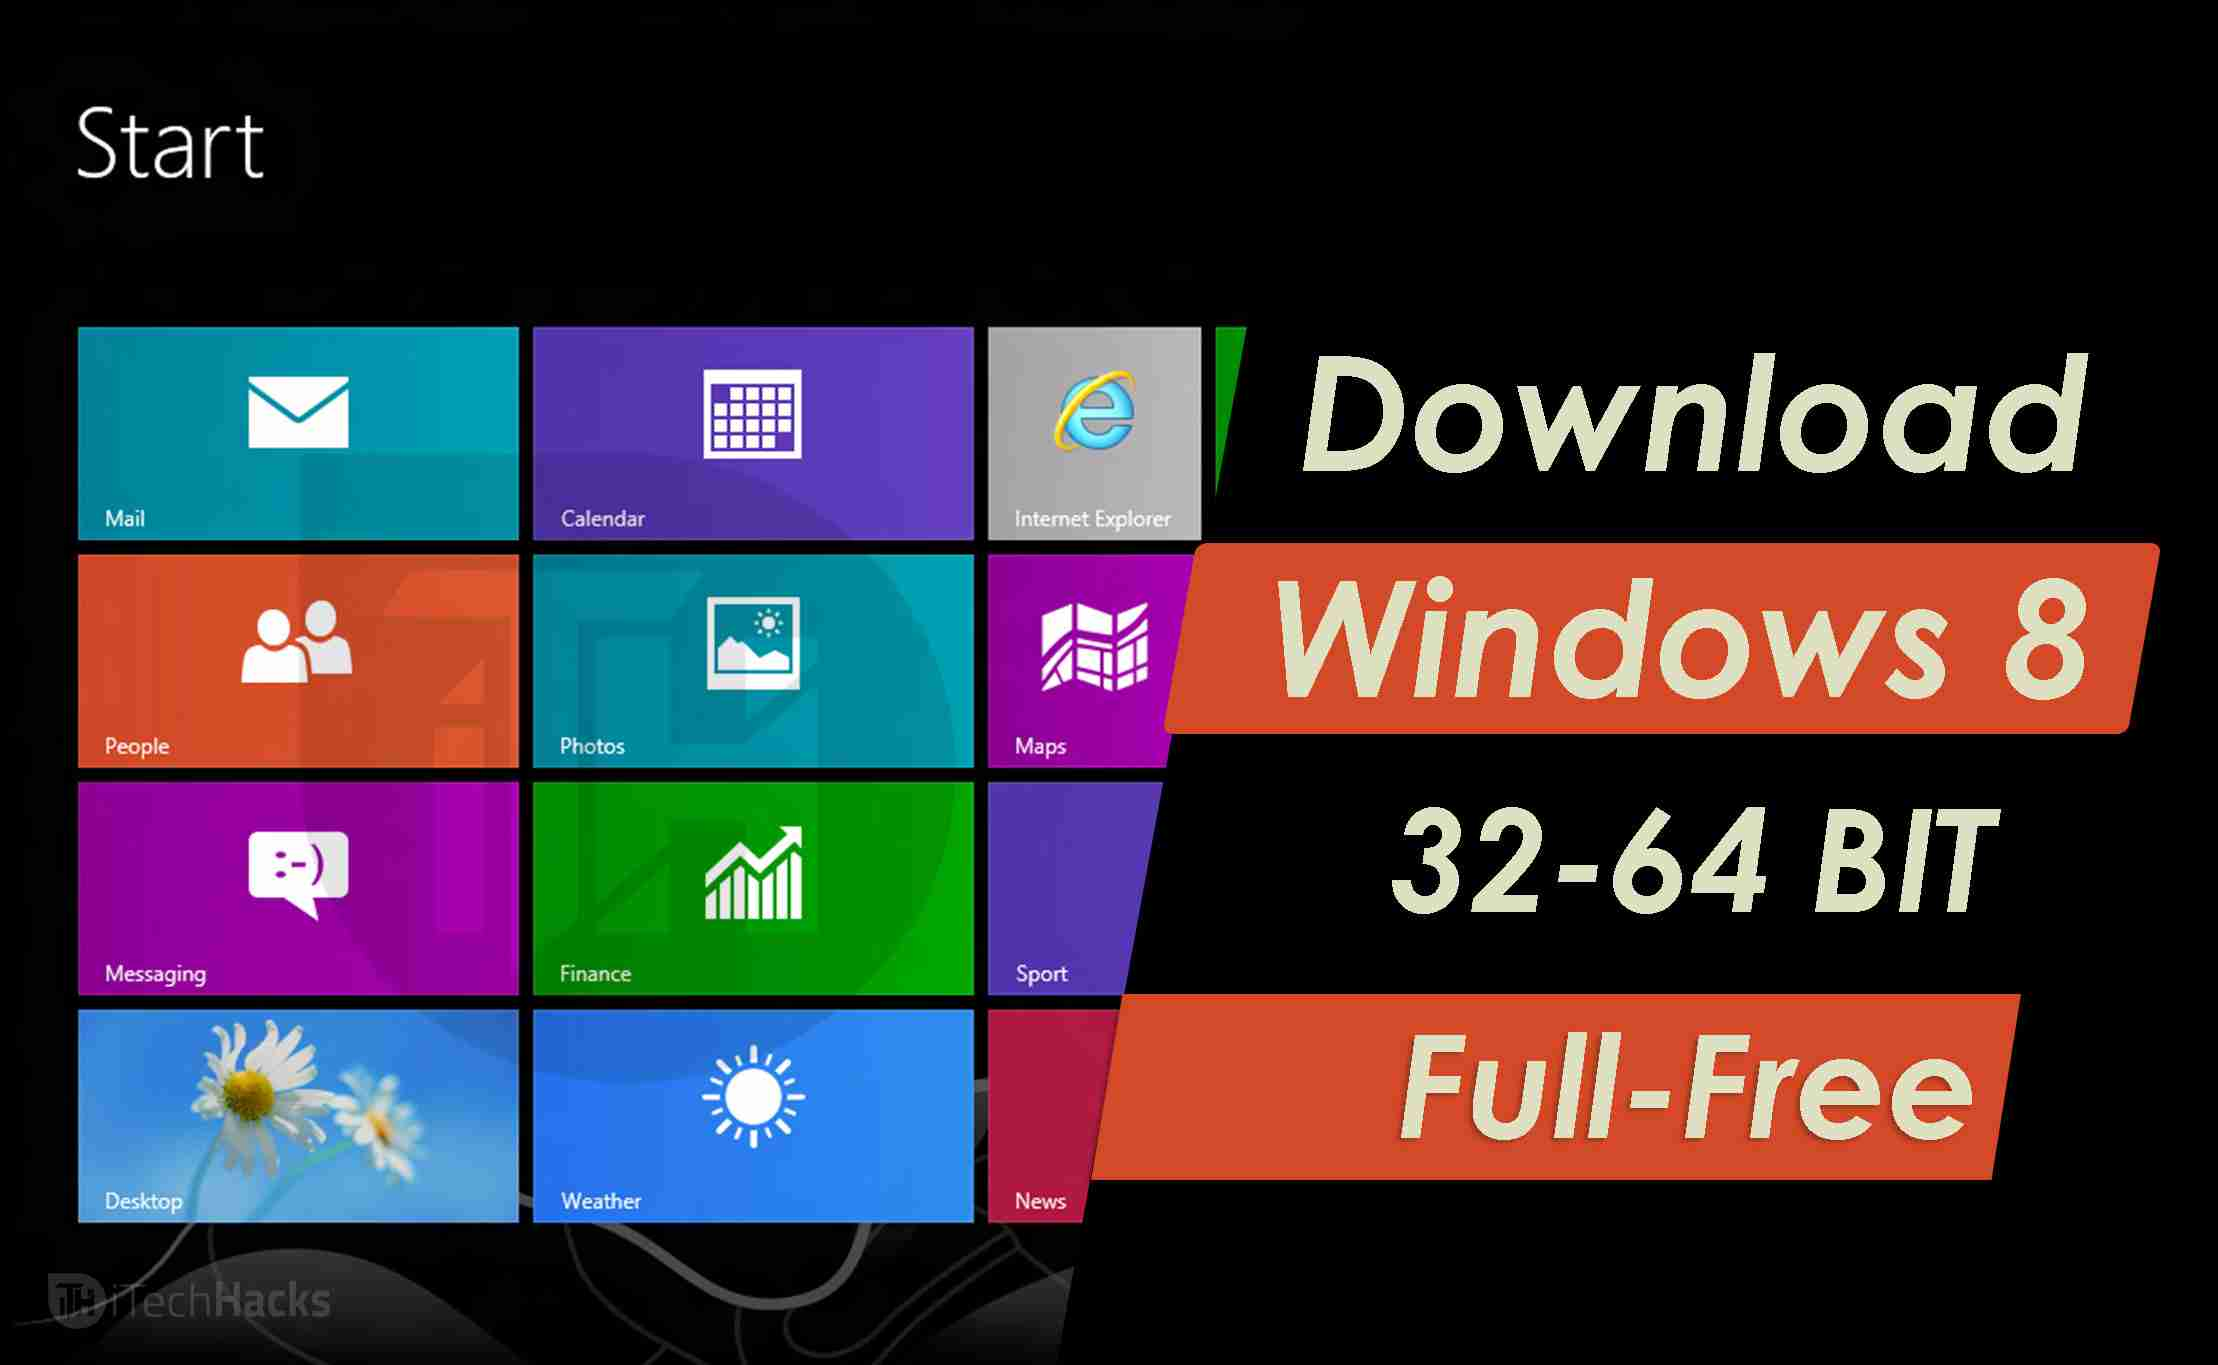 Download Windows 8 (32 Bit-64 Bit) Full Free 2020